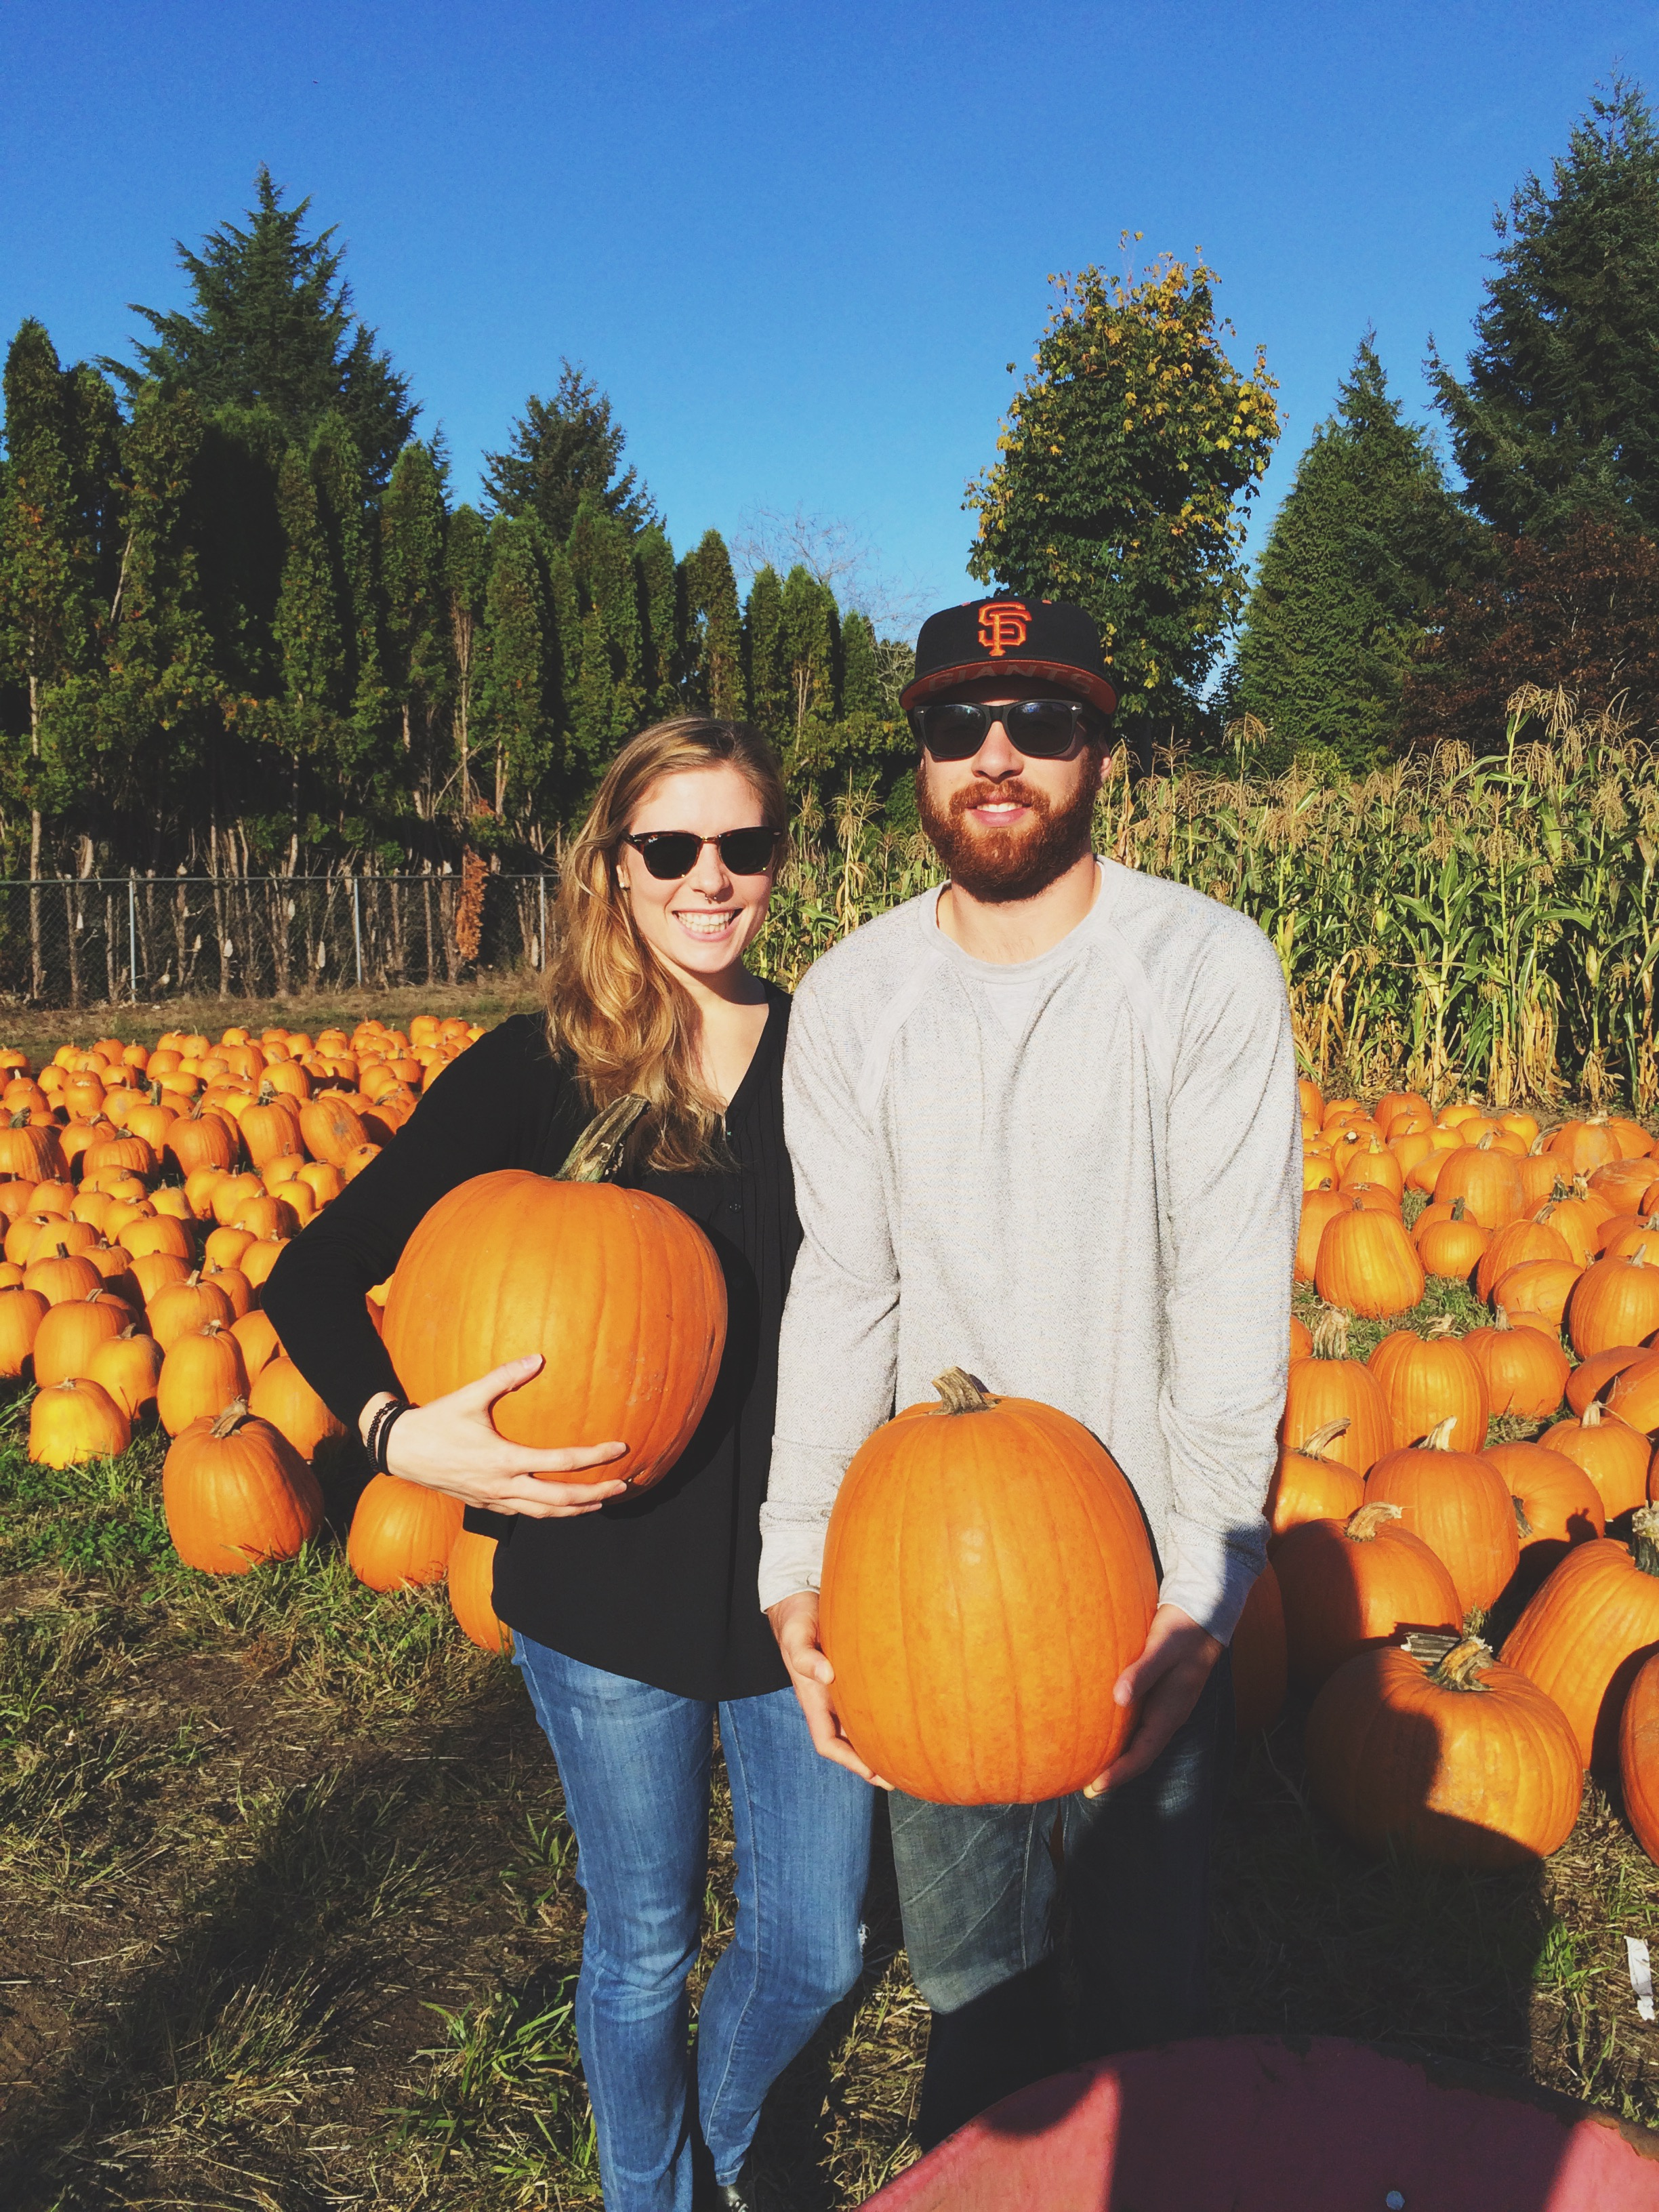 Obligatory pumpkin patch photo